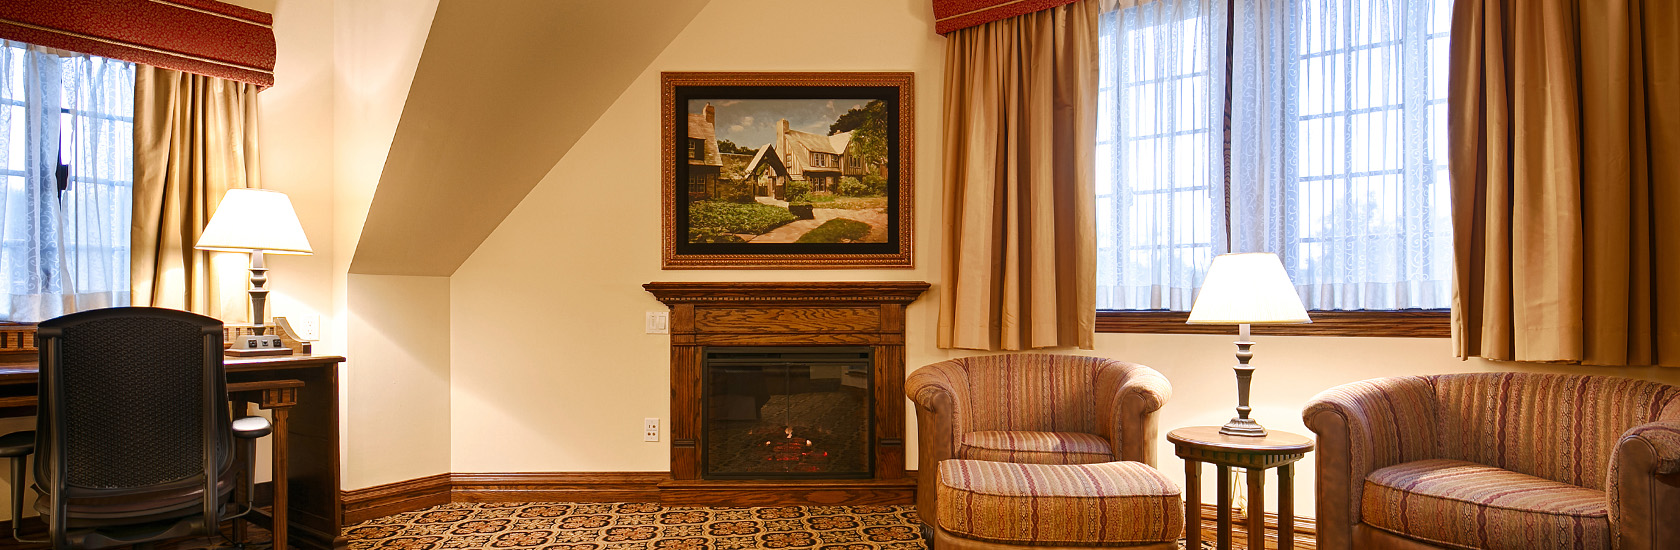 interior of mariemont inn cincinnati hotel room